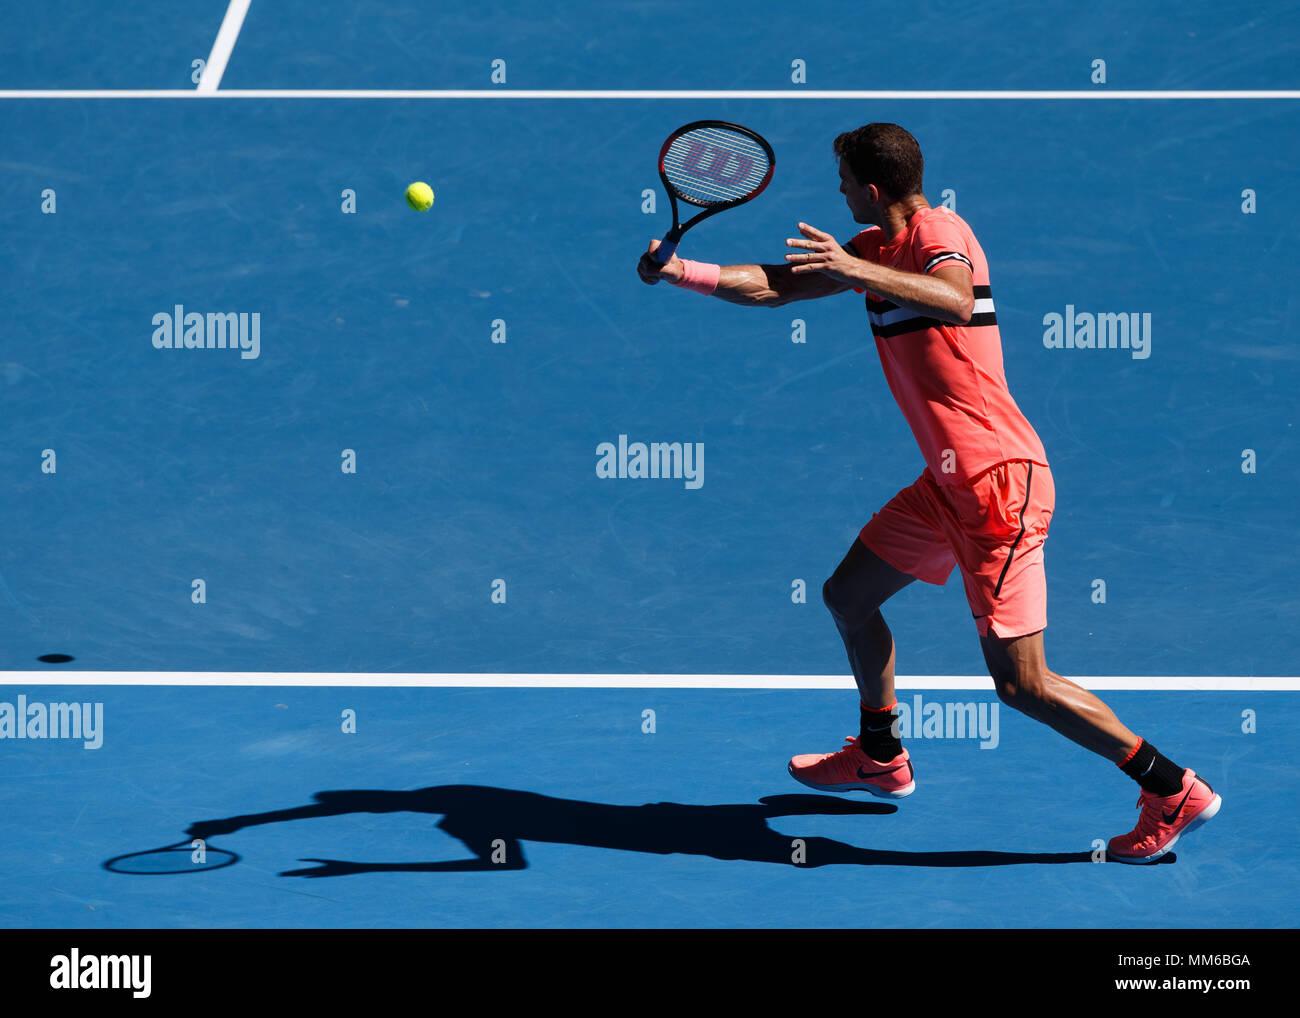 Bulgarian tennis player Grigor Dimitrov playing in Australian Open 2018 Tennis Tournament, Melbourne Park, Melbourne, Victoria, Australia. - Stock Image